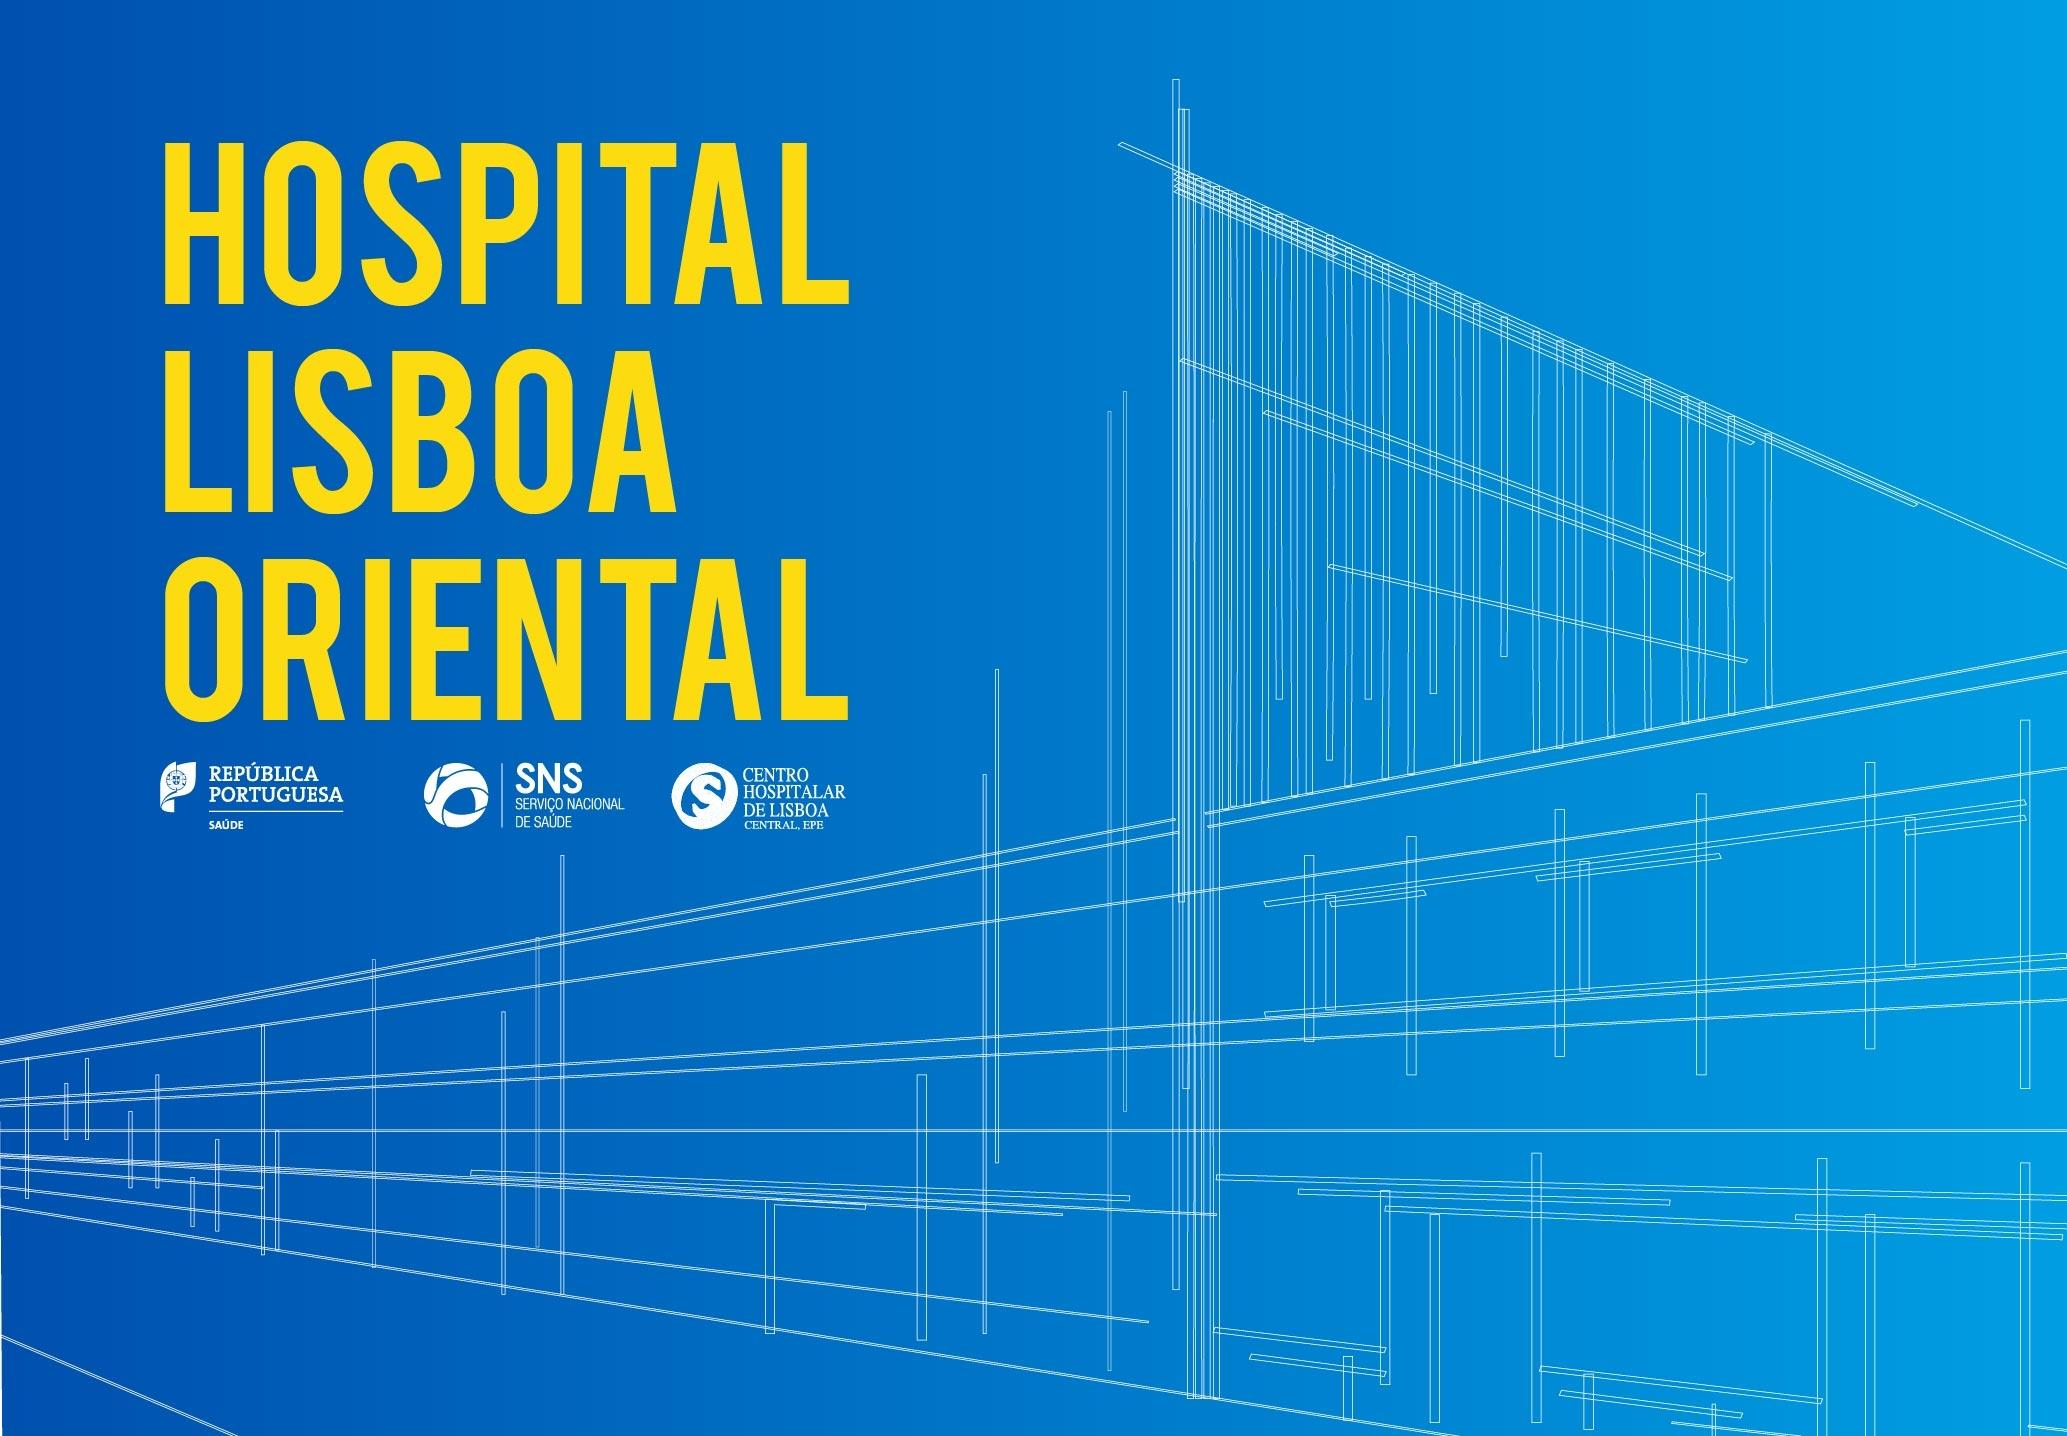 Novo Hospital Lisboa Oriental